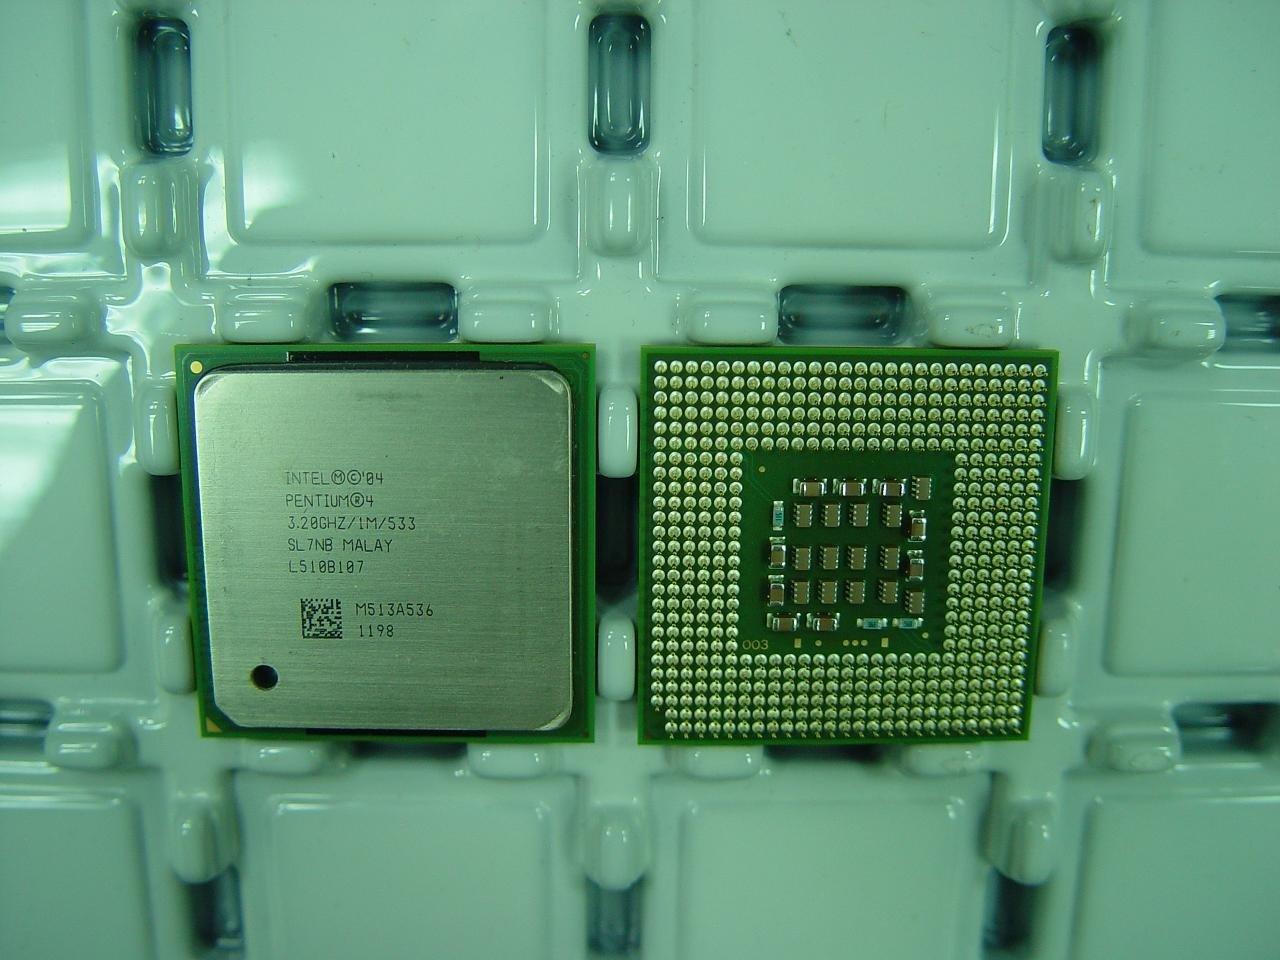 Intel Cpu Mobile Pentium 4 538 Buy P Sl7nb Processor Socket 478 Sl7nblaptop Sl7nbserver Product On